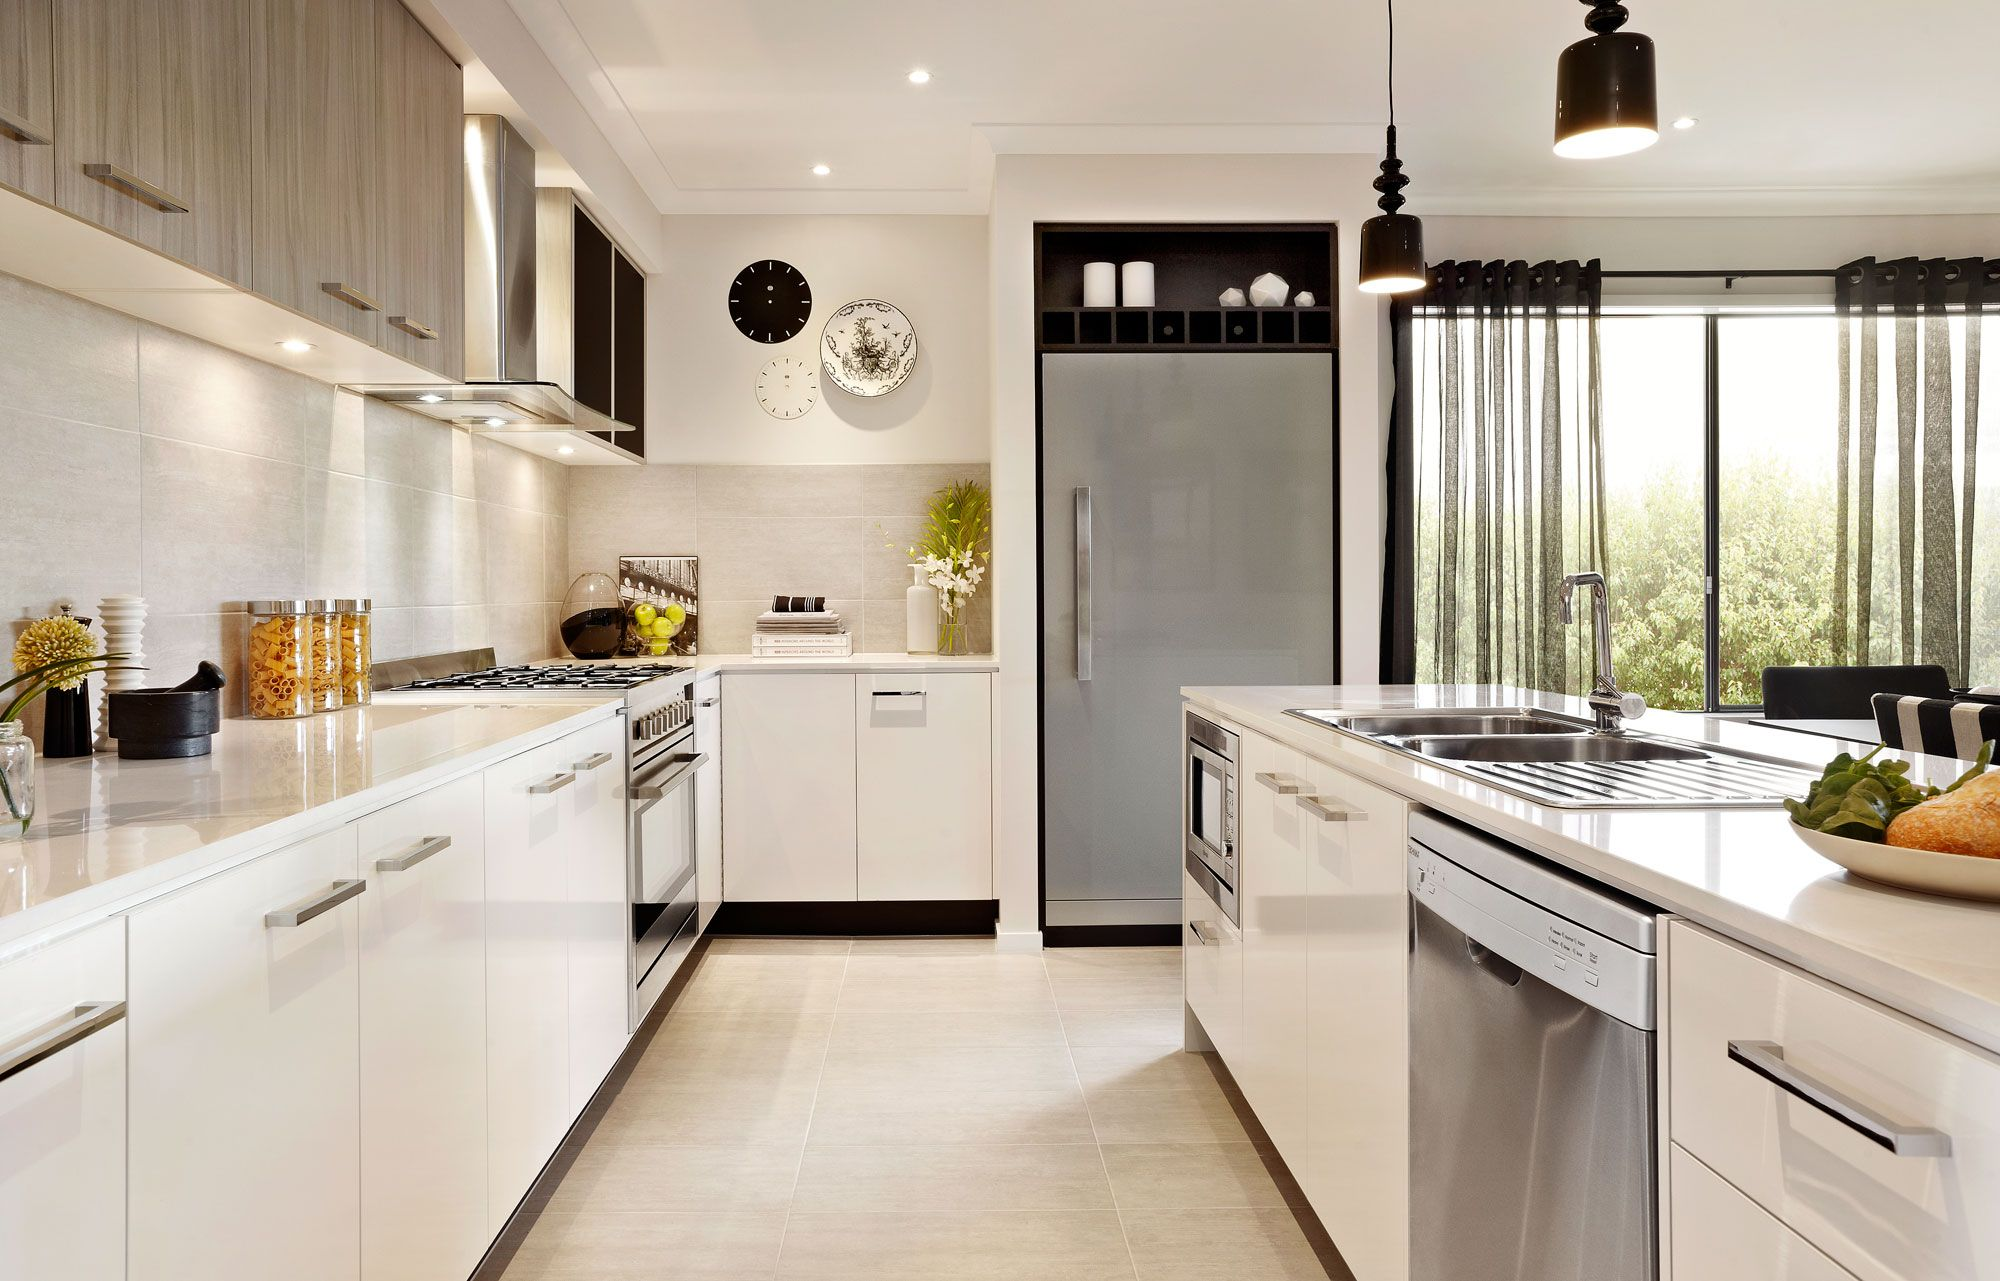 Carlisle Homes - Marlow 25 Kitchen   Marlow 25   Pinterest   Marlow ...